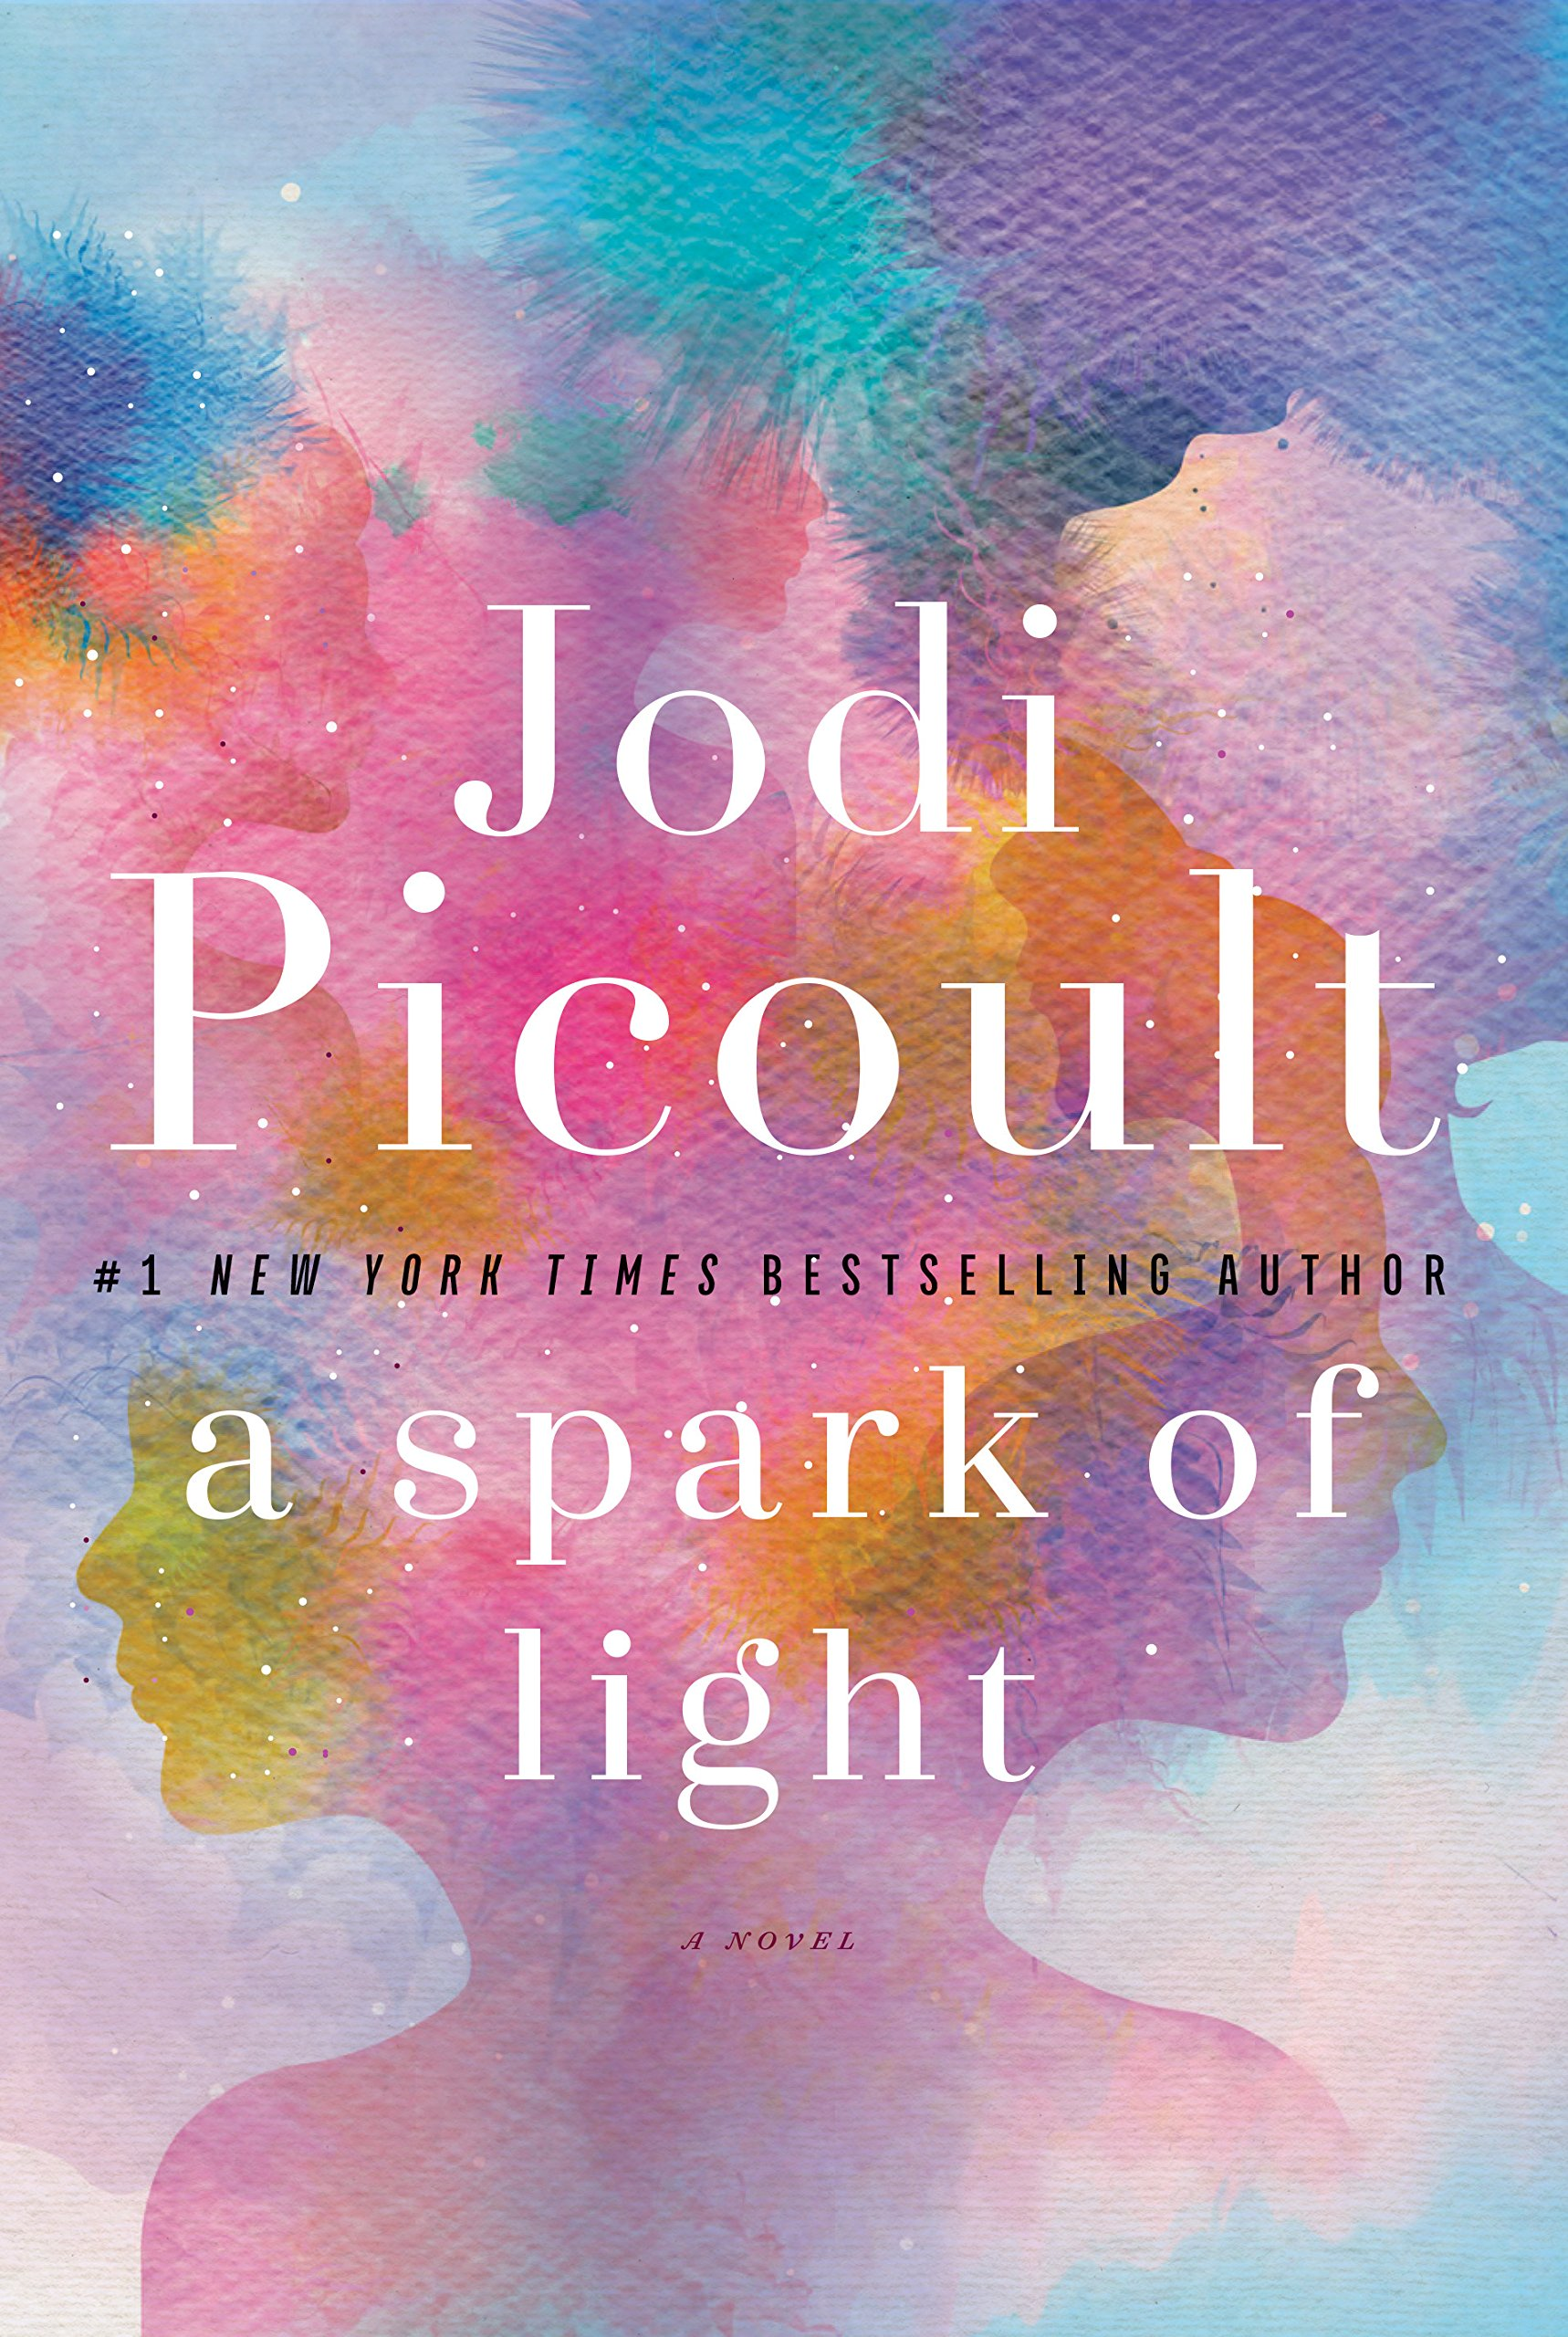 A Spark of Light: A Novel: Jodi Picoult: 9780345813411: Books - Amazon.ca